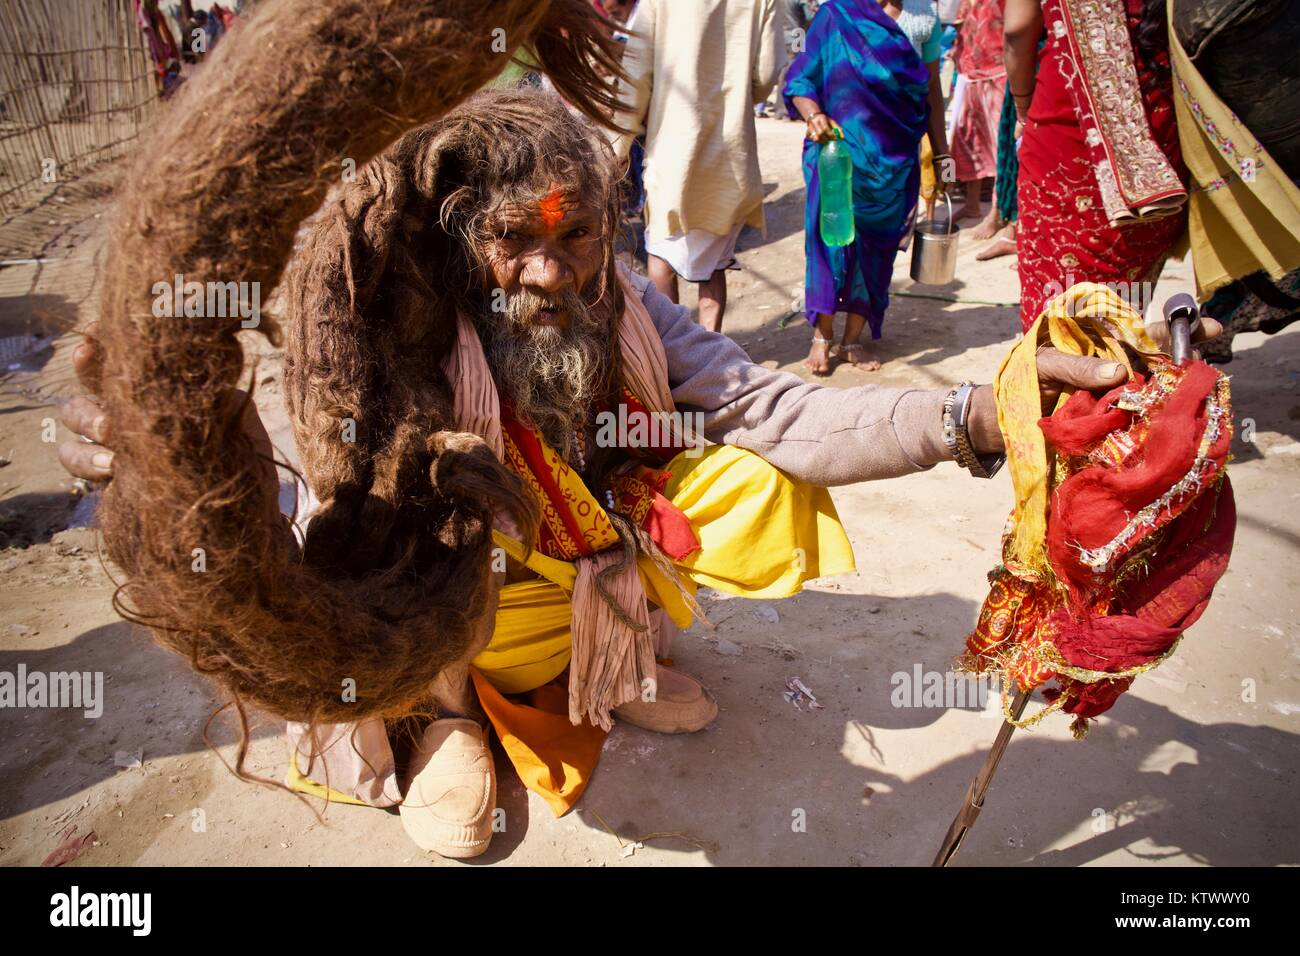 Sadhu with enormous dreadlock braid in 2013 Kumbha Mela in Allahabad (Prayag) - Stock Image